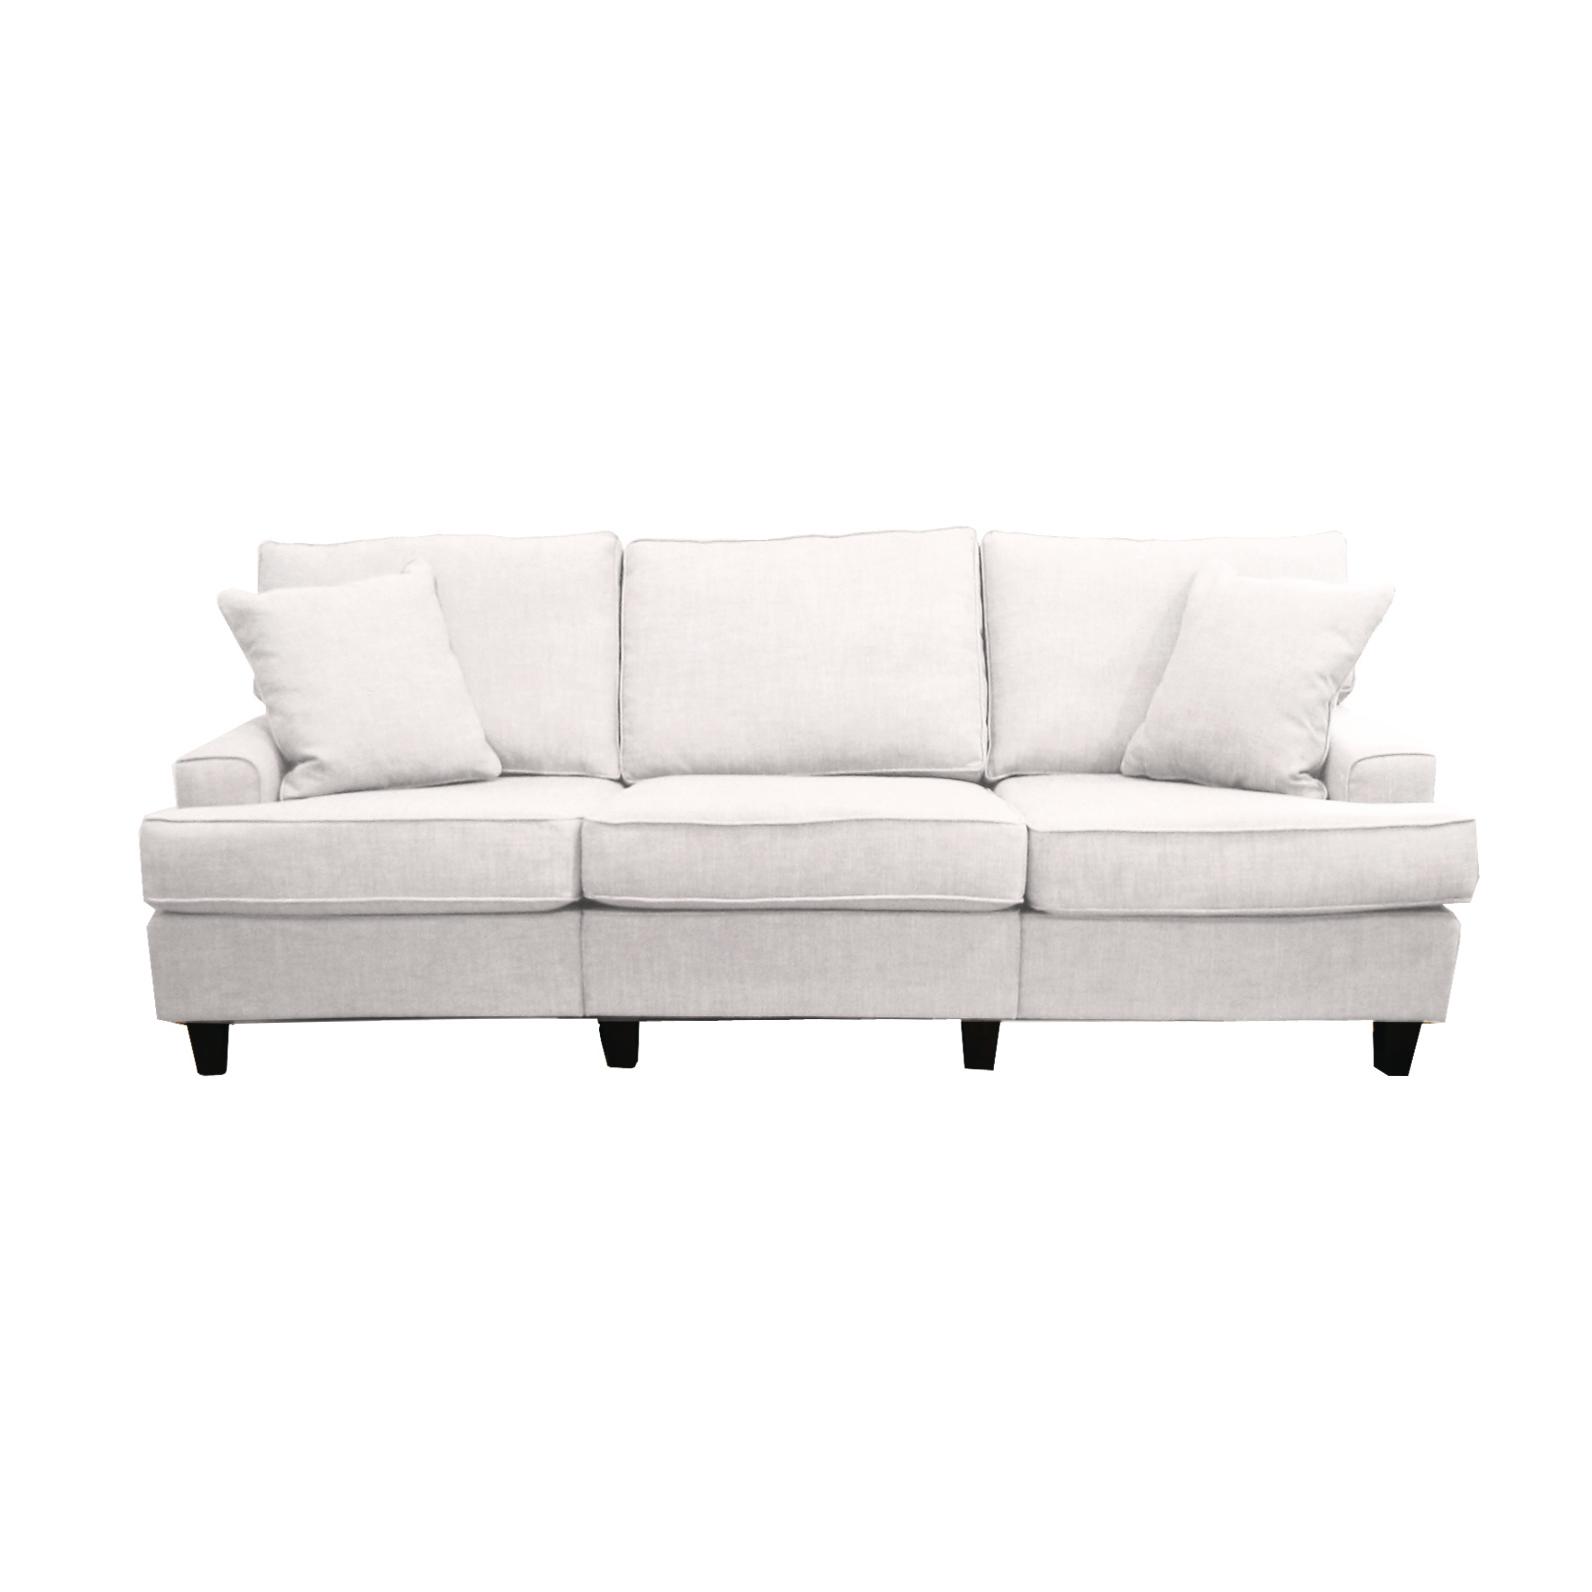 Sandhamn soffa 3,5-sits - englesson.se